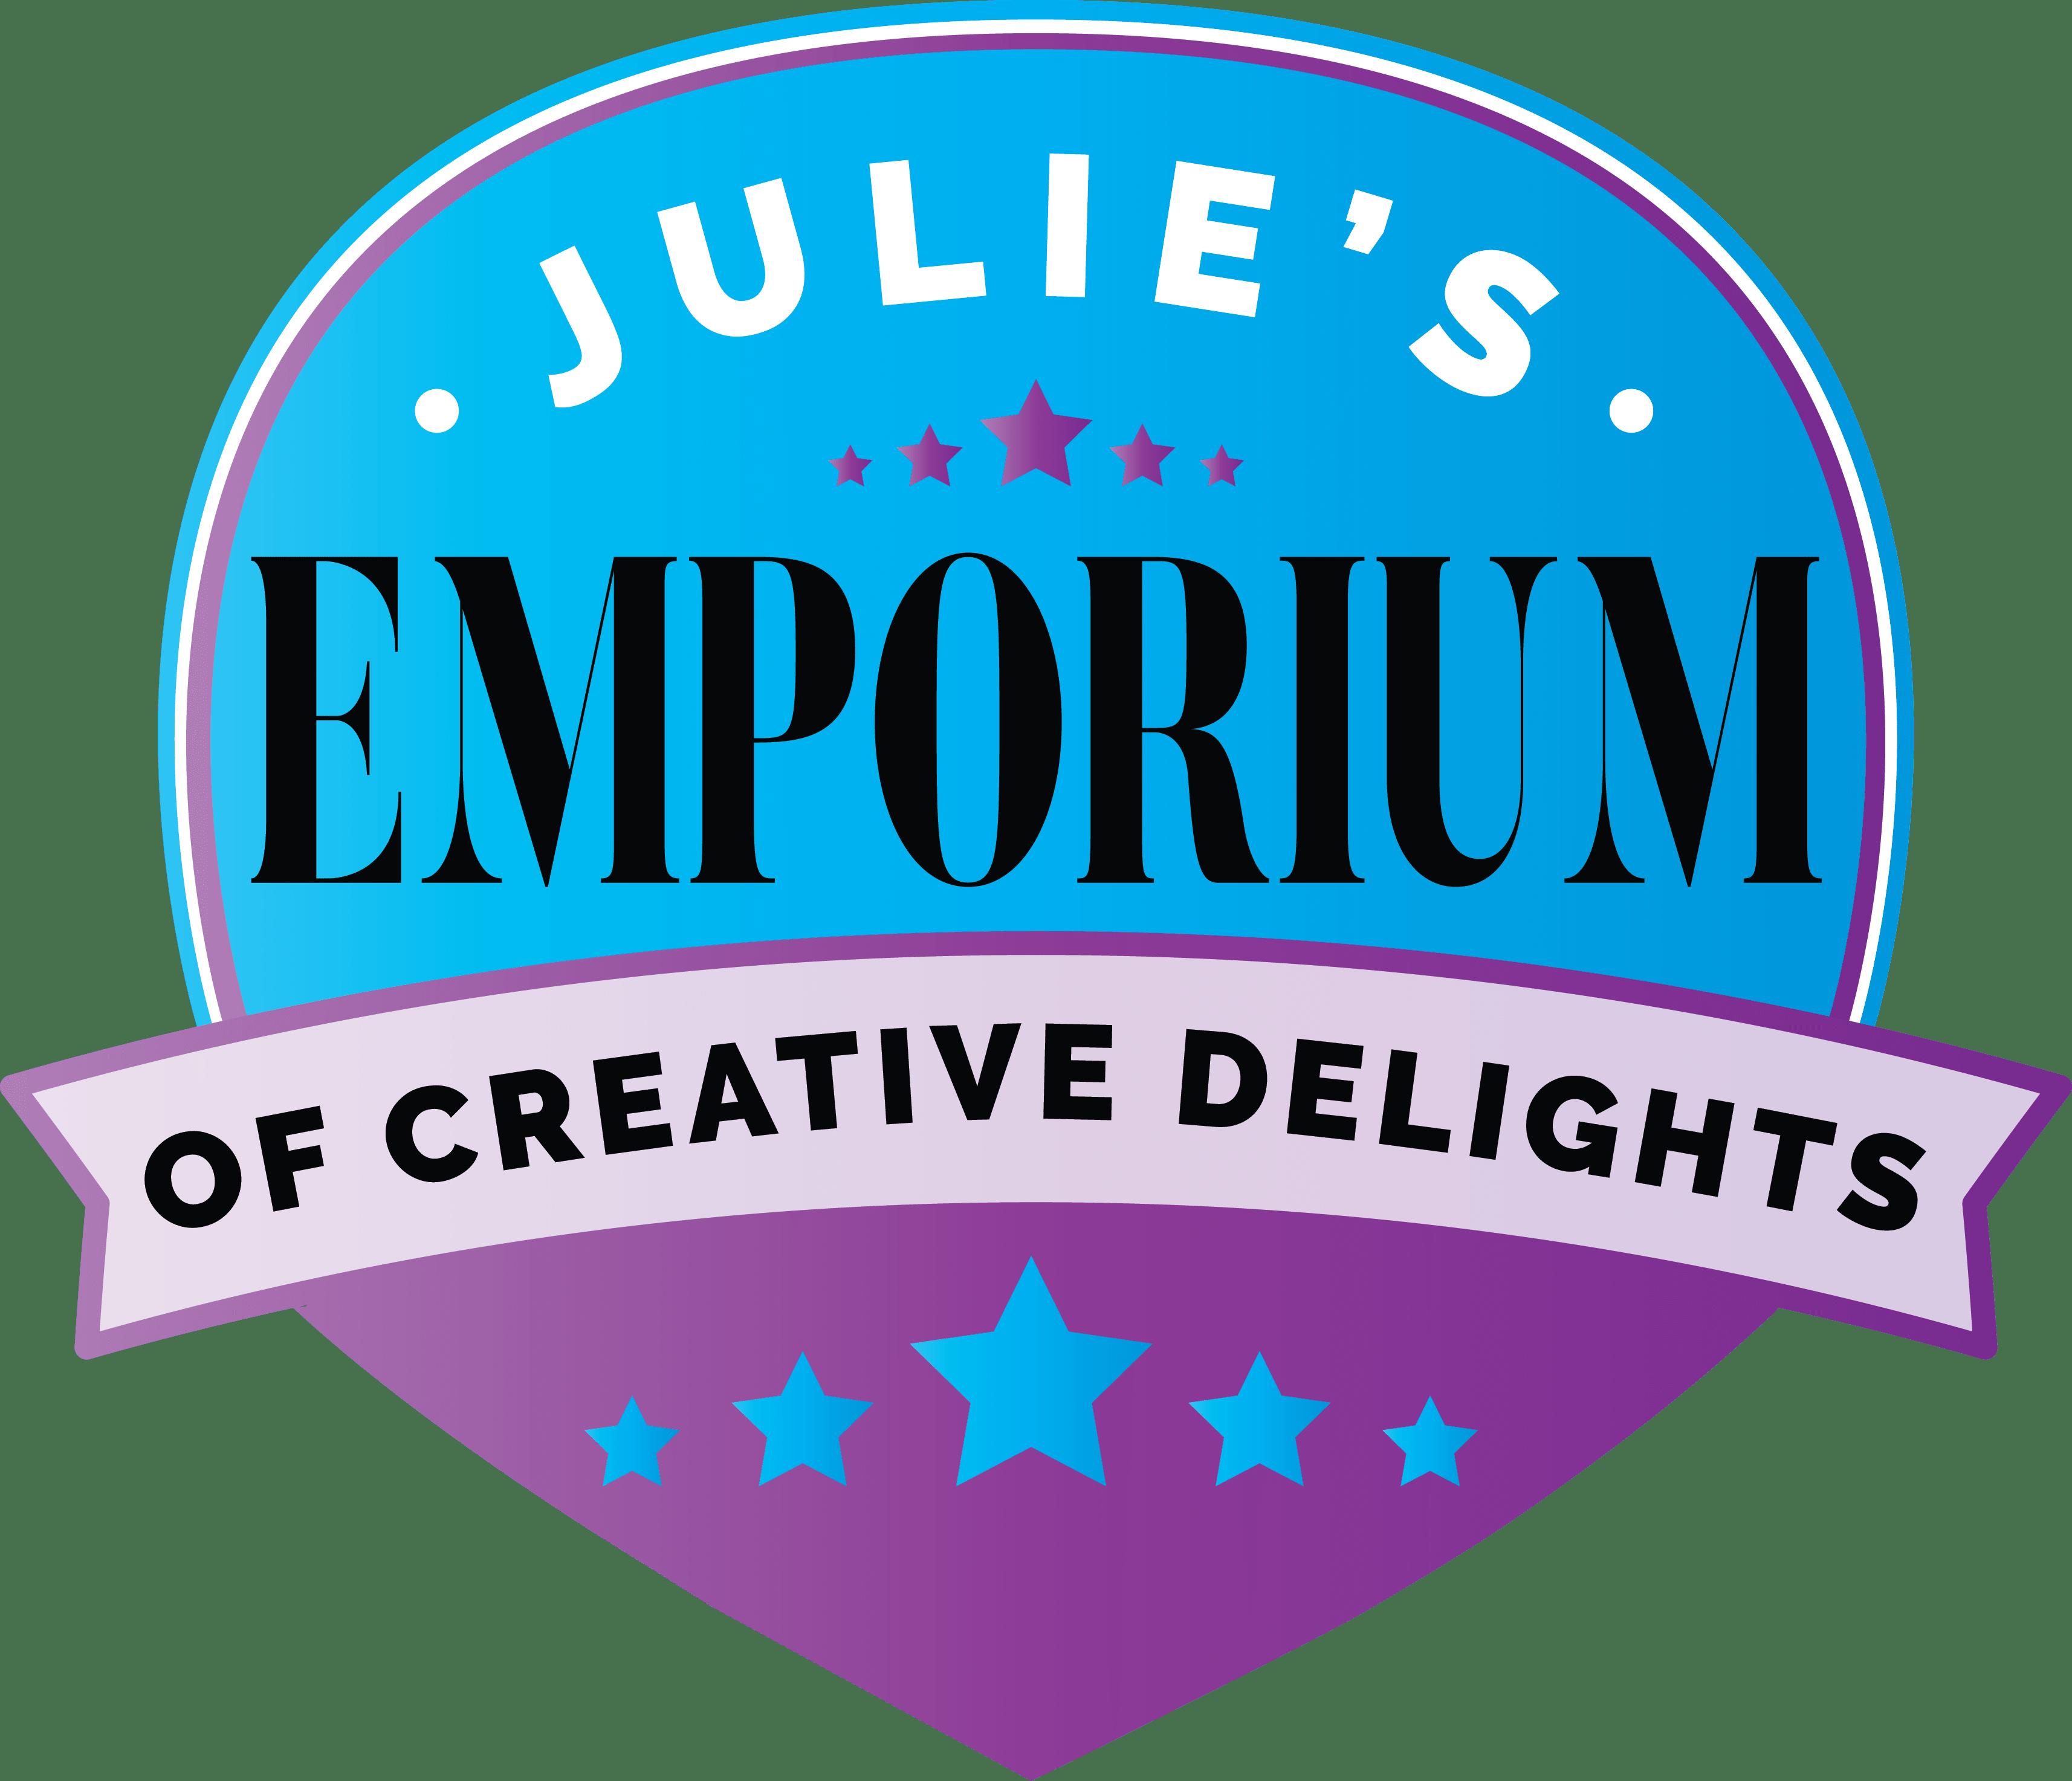 Julie's Emporium Of Creative Delights